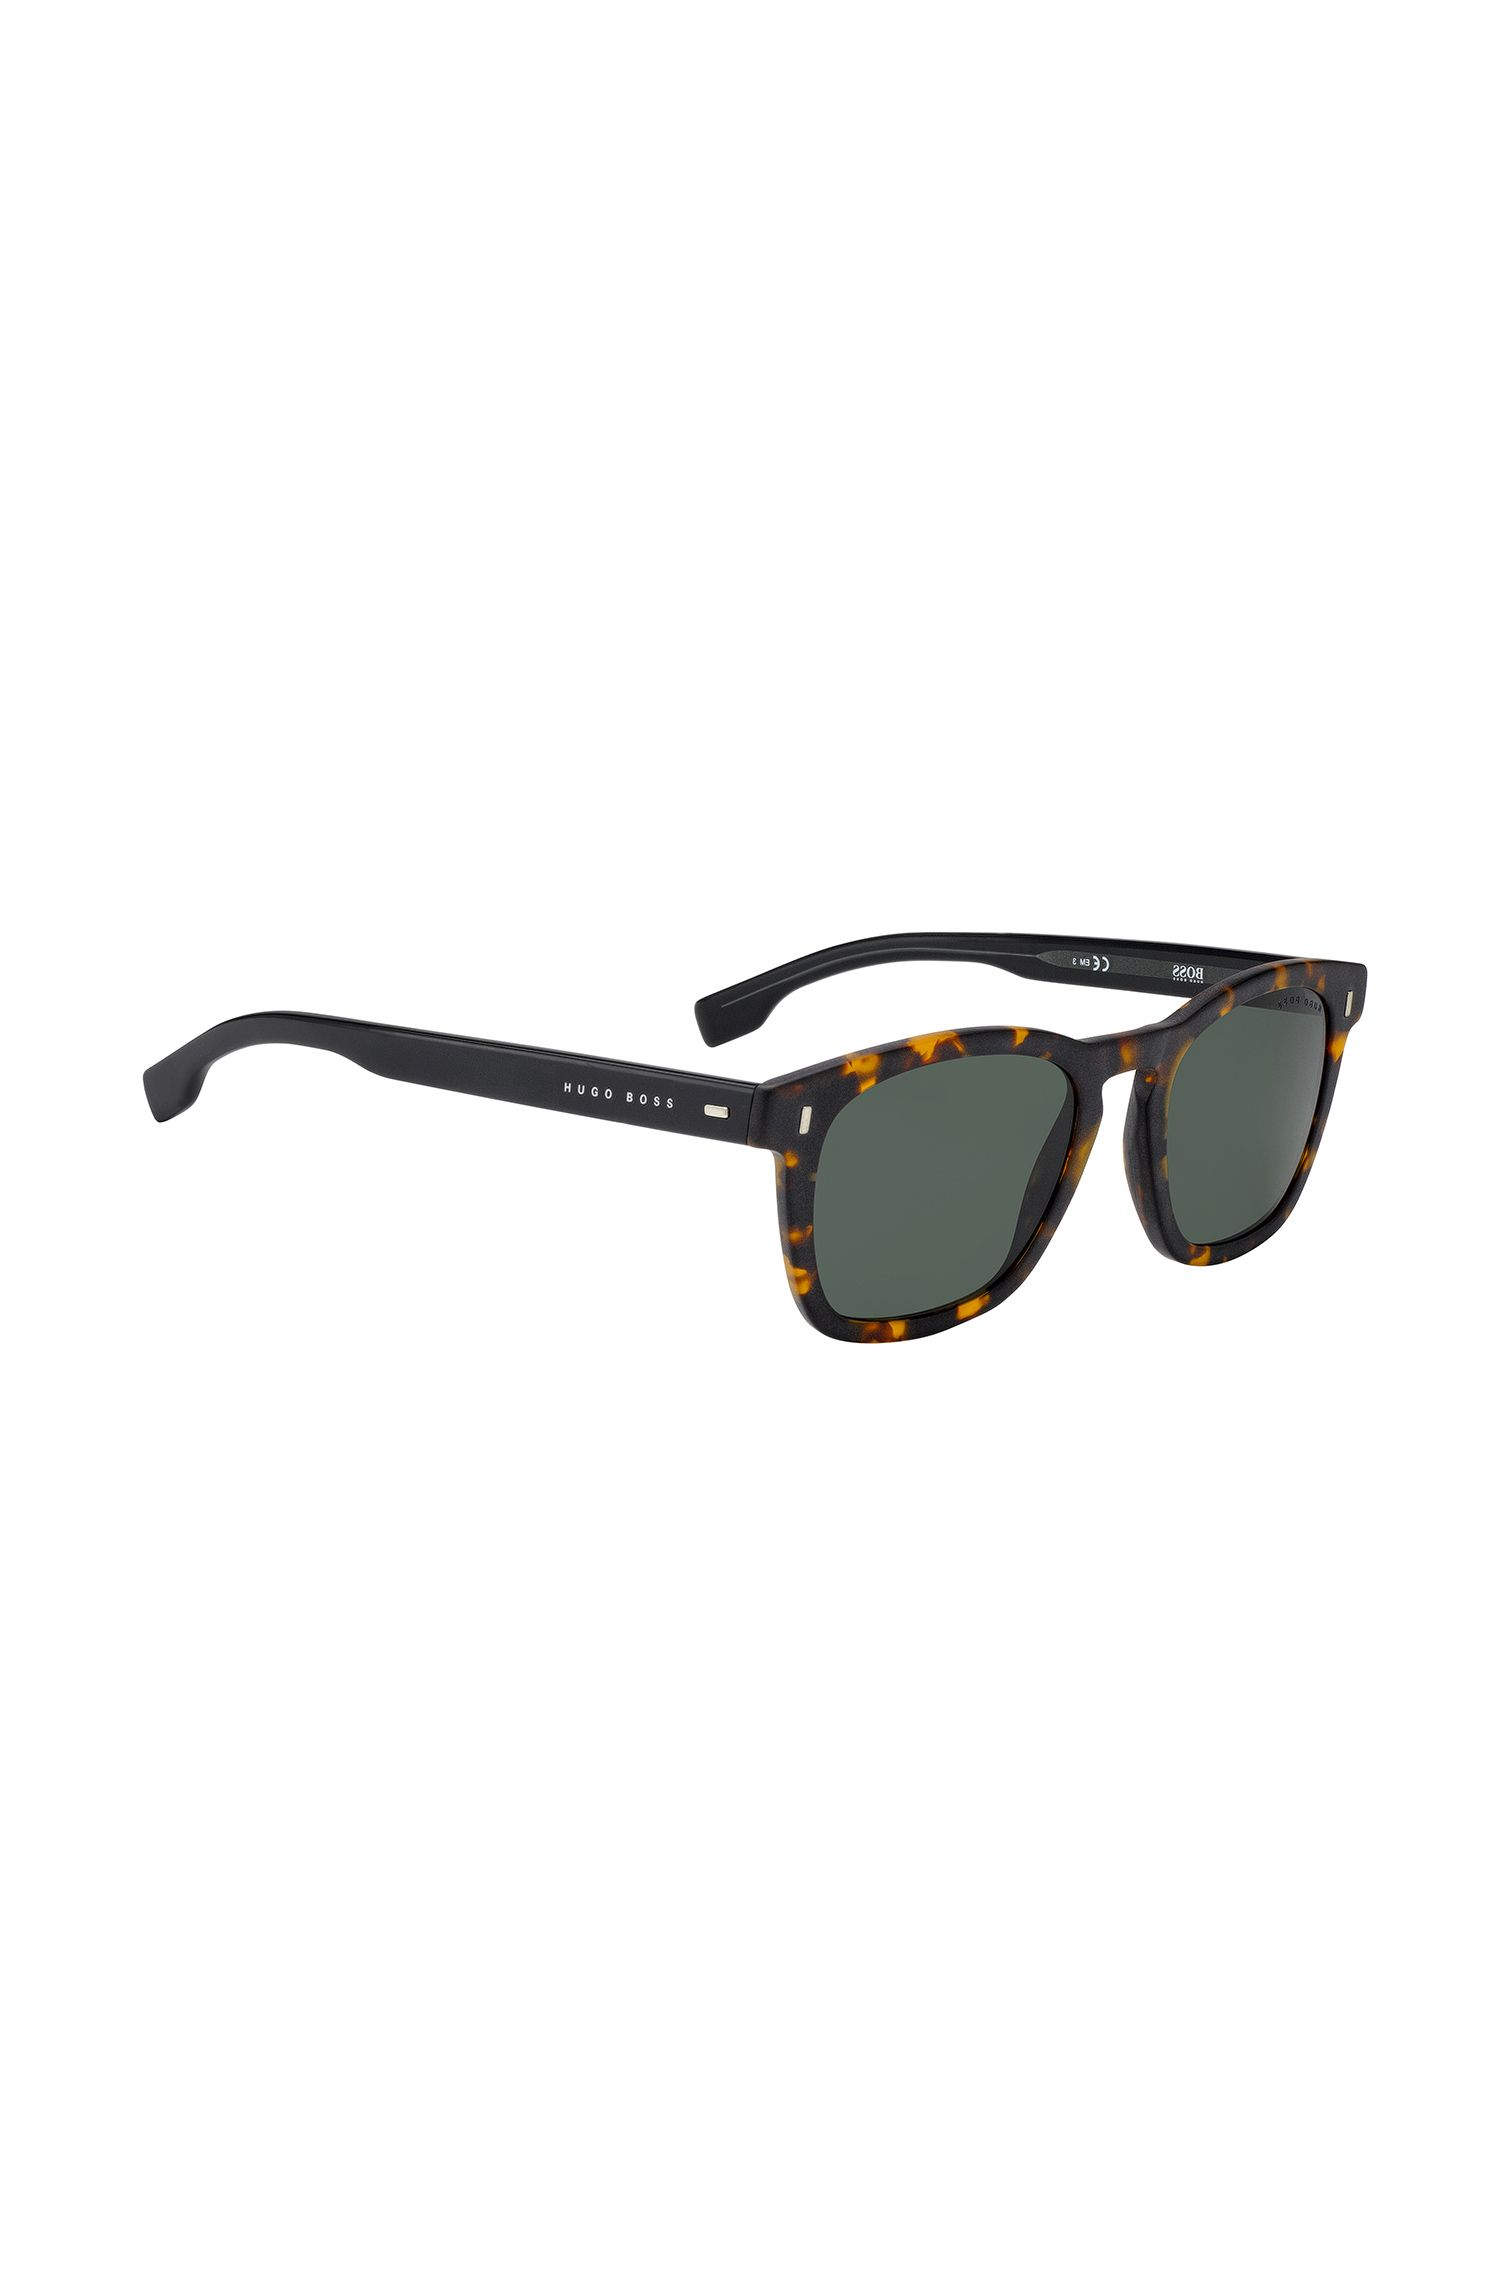 Wayfarer-inspired sunglasses with Havana pattern, Patterned